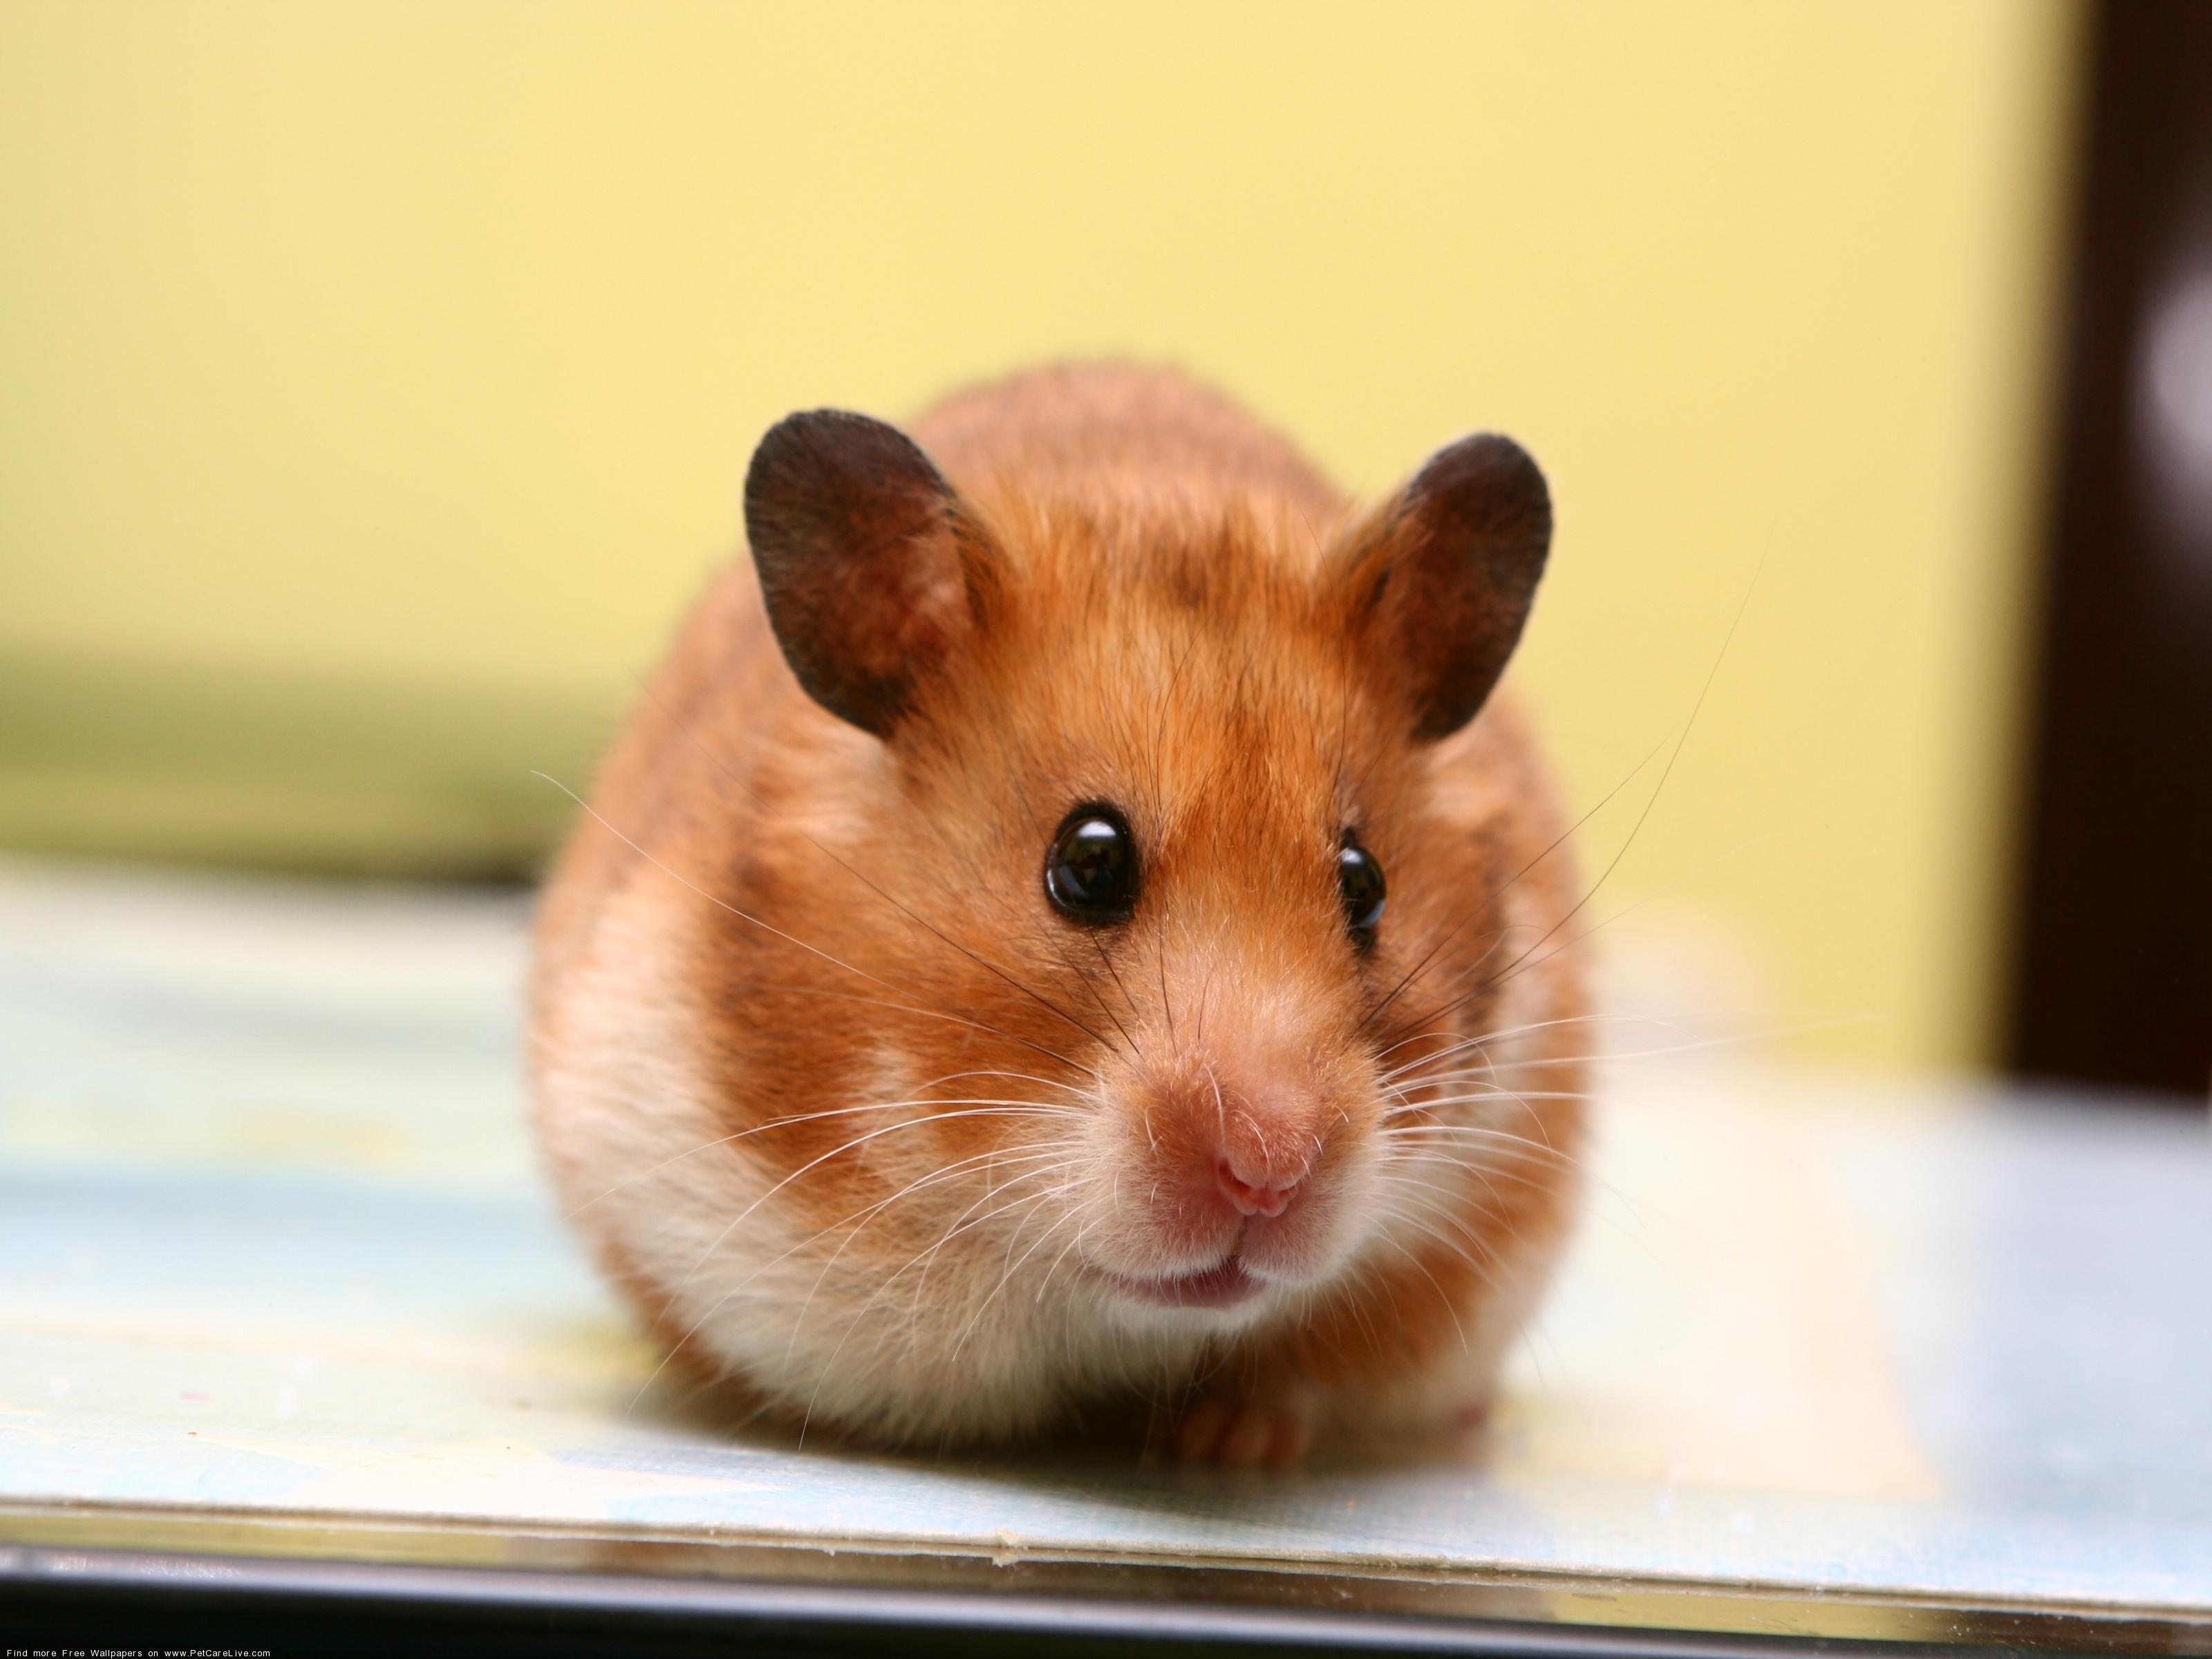 hamster 1080p full hd